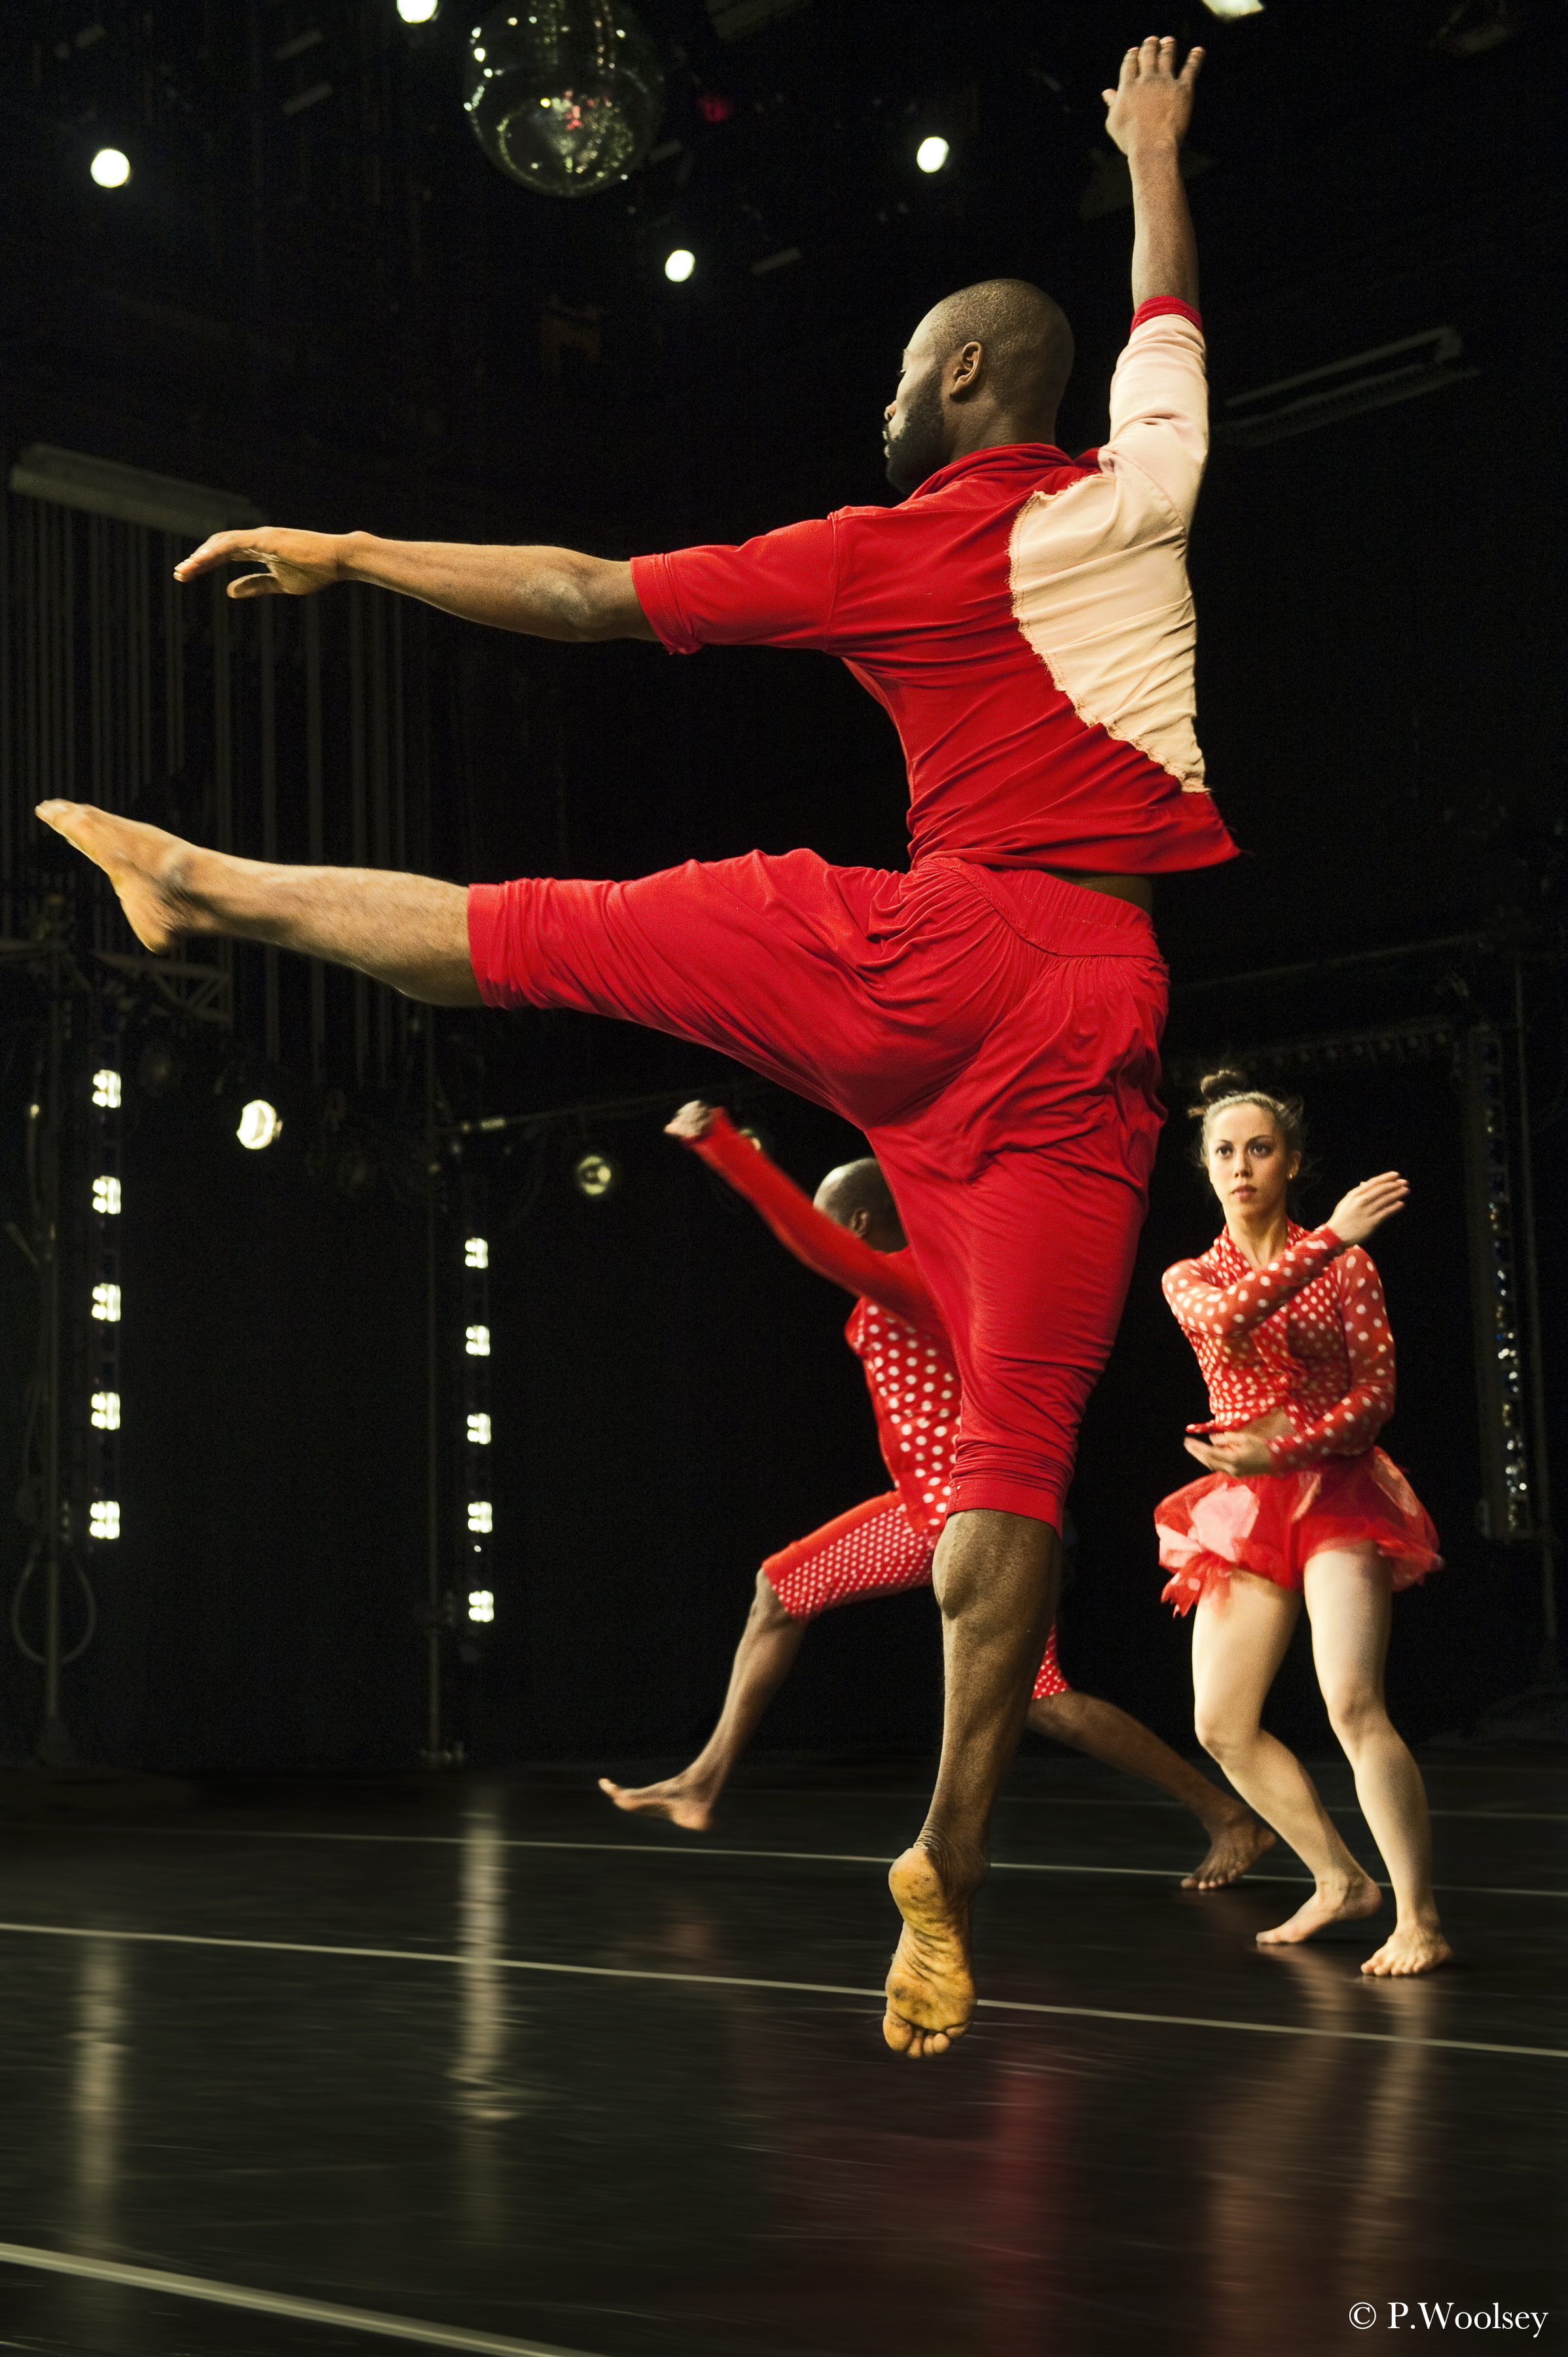 Photo Peggy Woolsey_dancers Clement Mensah, Paul Hamilton, Anna Schön.jpg